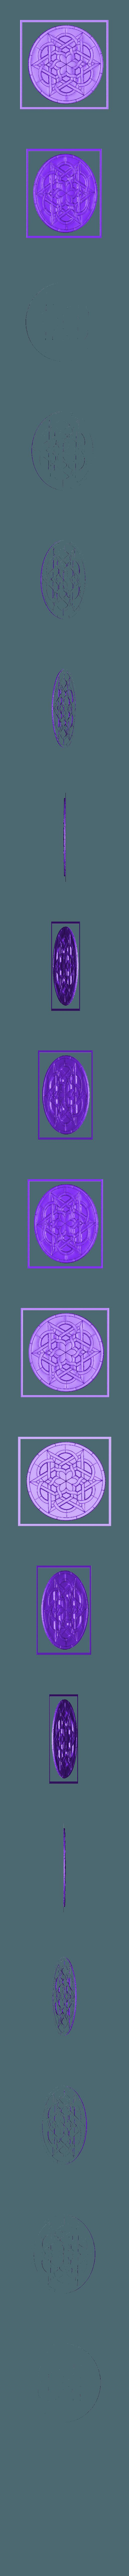 Celt.stl Download free STL file Celtic • 3D printer object, Account-Closed